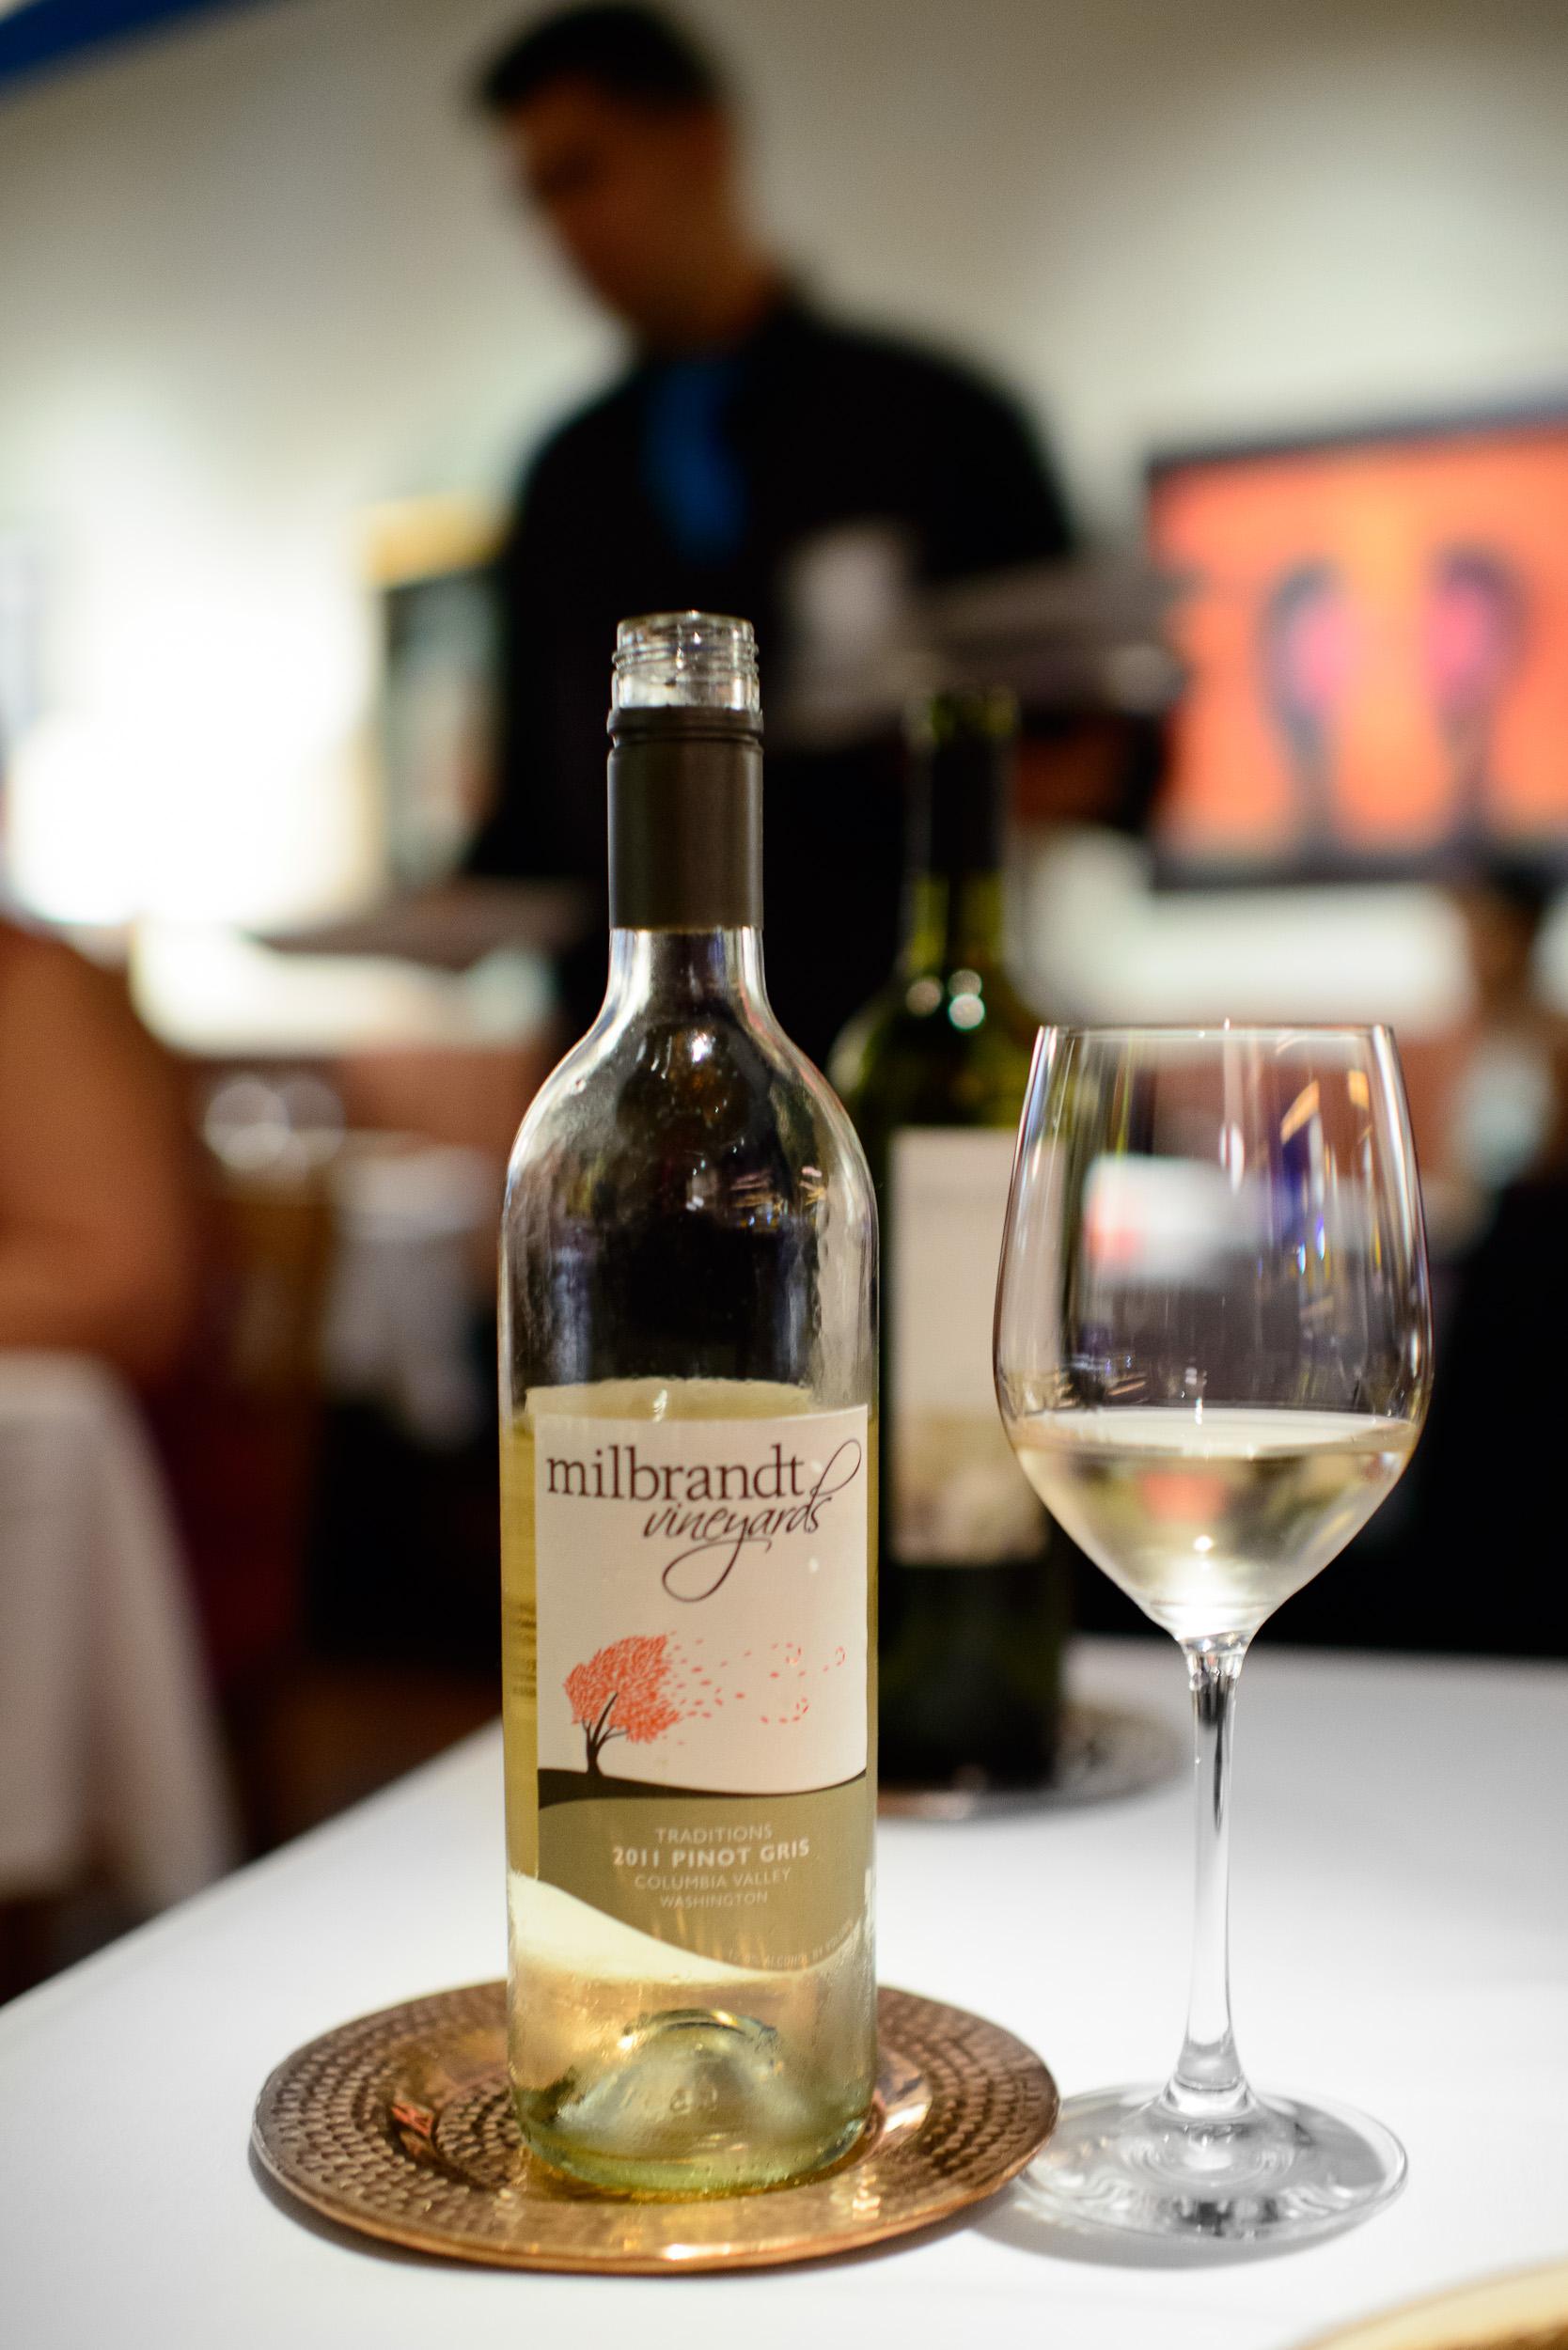 Milbrandt Vineyards Pinot Gris, 2011, Columbia Valley, Washingto